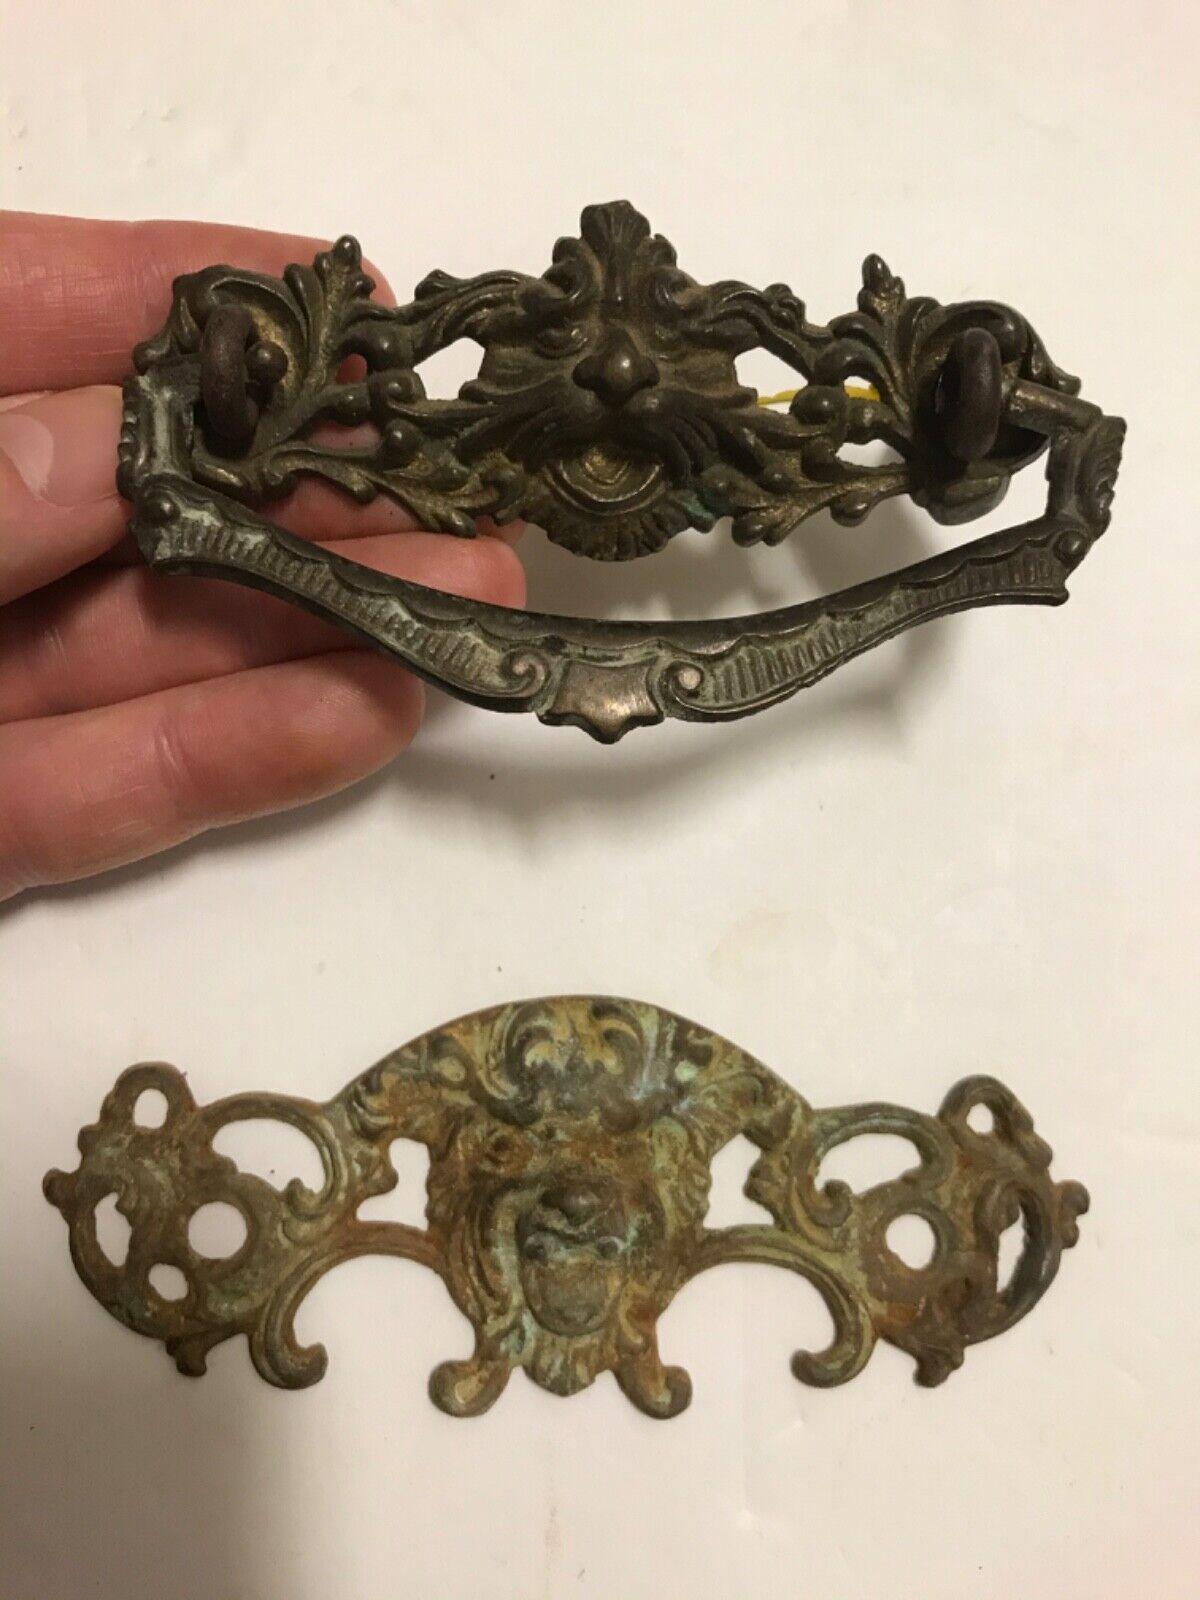 Two Antique Gargoyle Or North Wind Brass Pulls, Knobs, Architectural Interest - $18.00